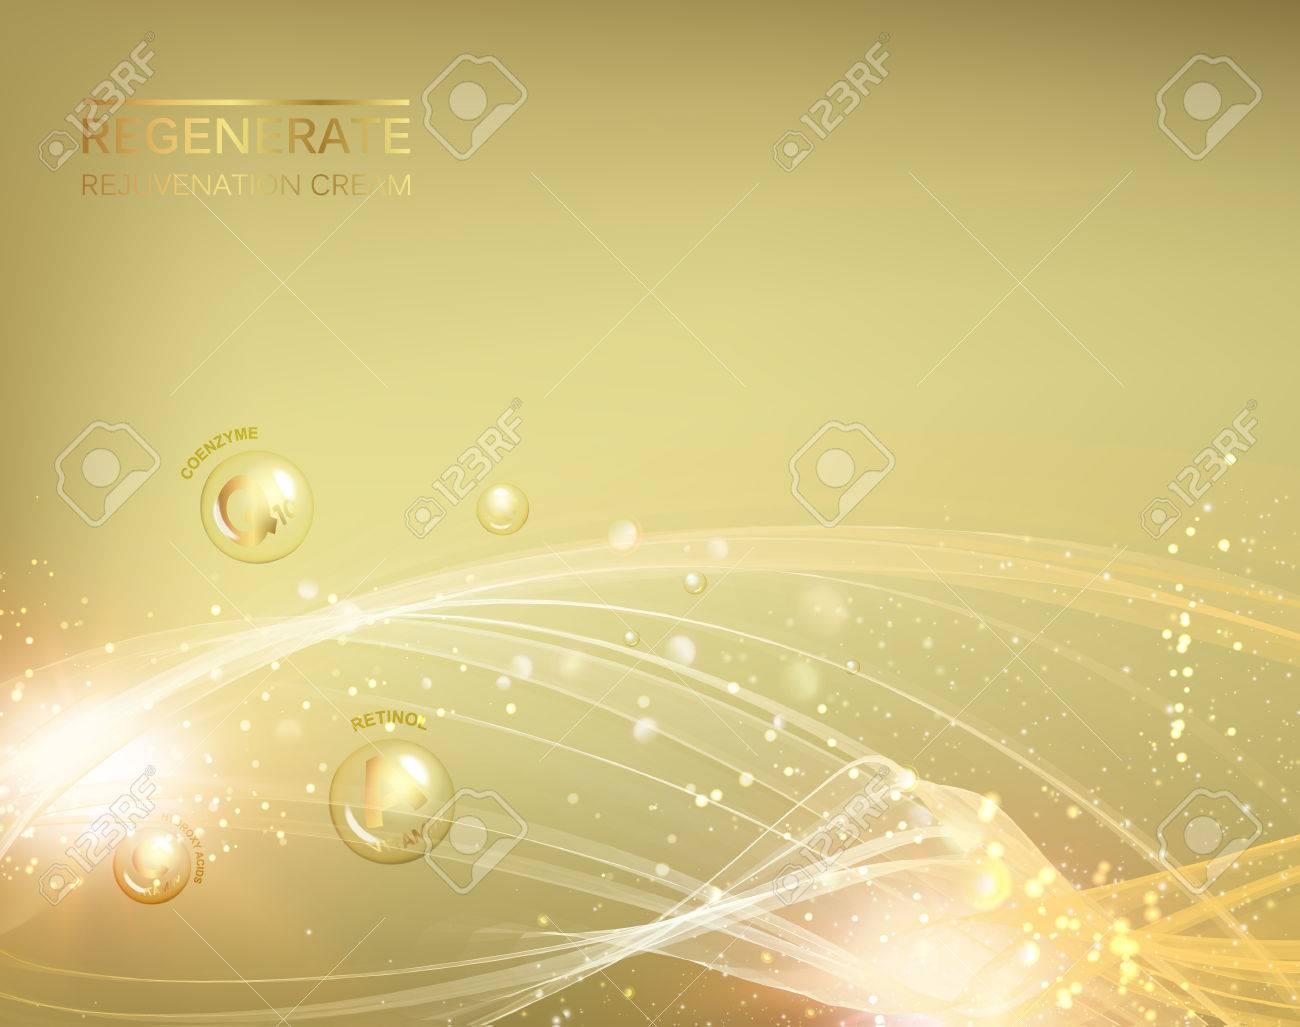 Science illustration of a cream molecule. Regenerate face cream and Vitamin complex concept. Organic cosmetic and skin care cream. Beauty skin care design over golden background. Vector illustration. - 64465230